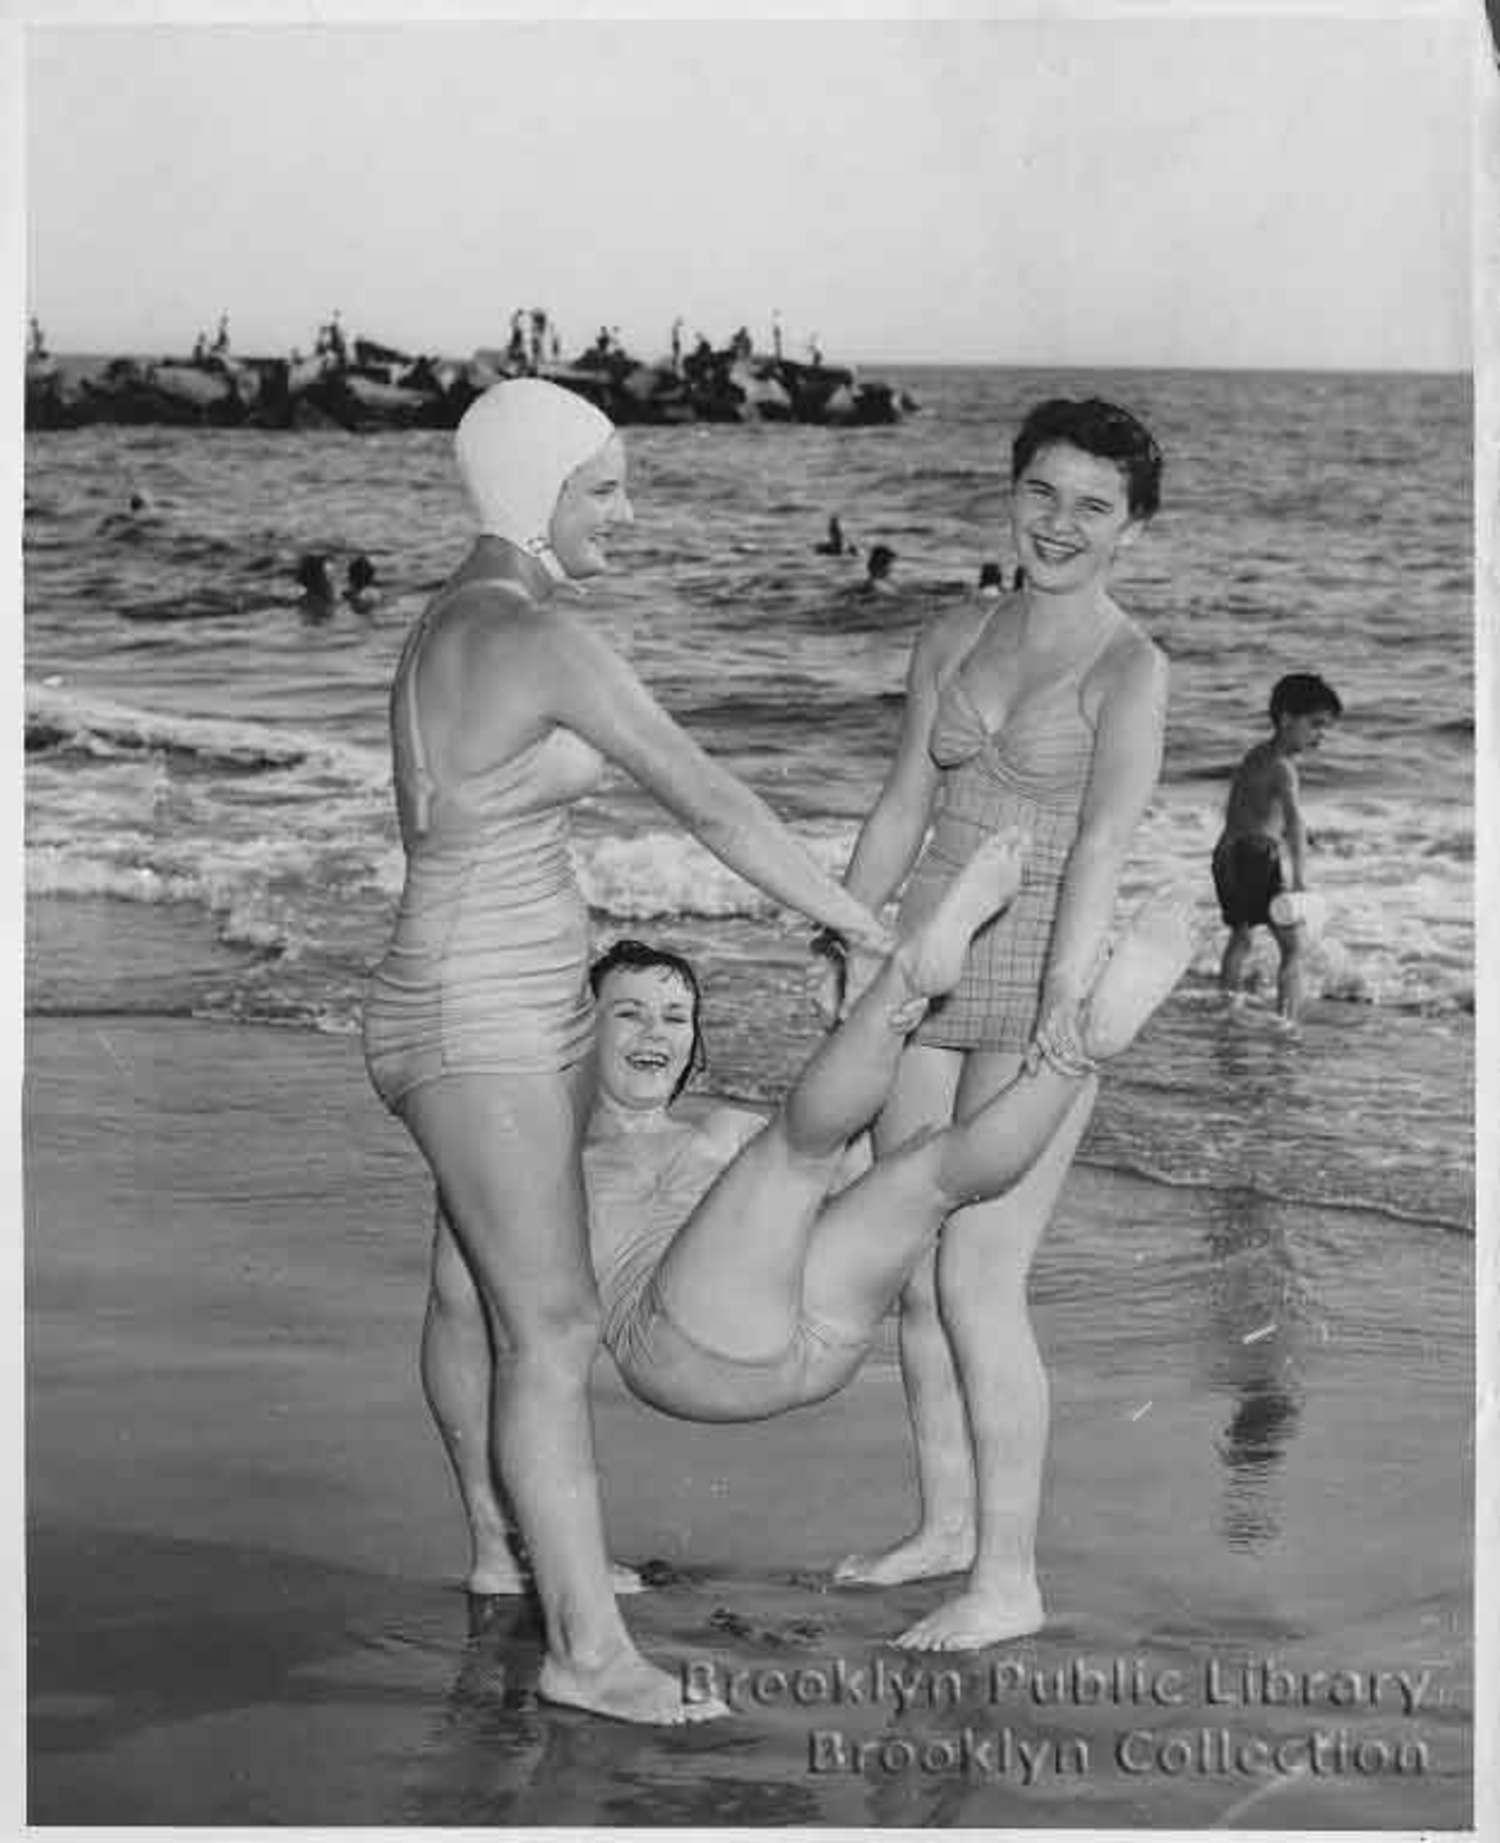 Ladies launching ladies in 1949.